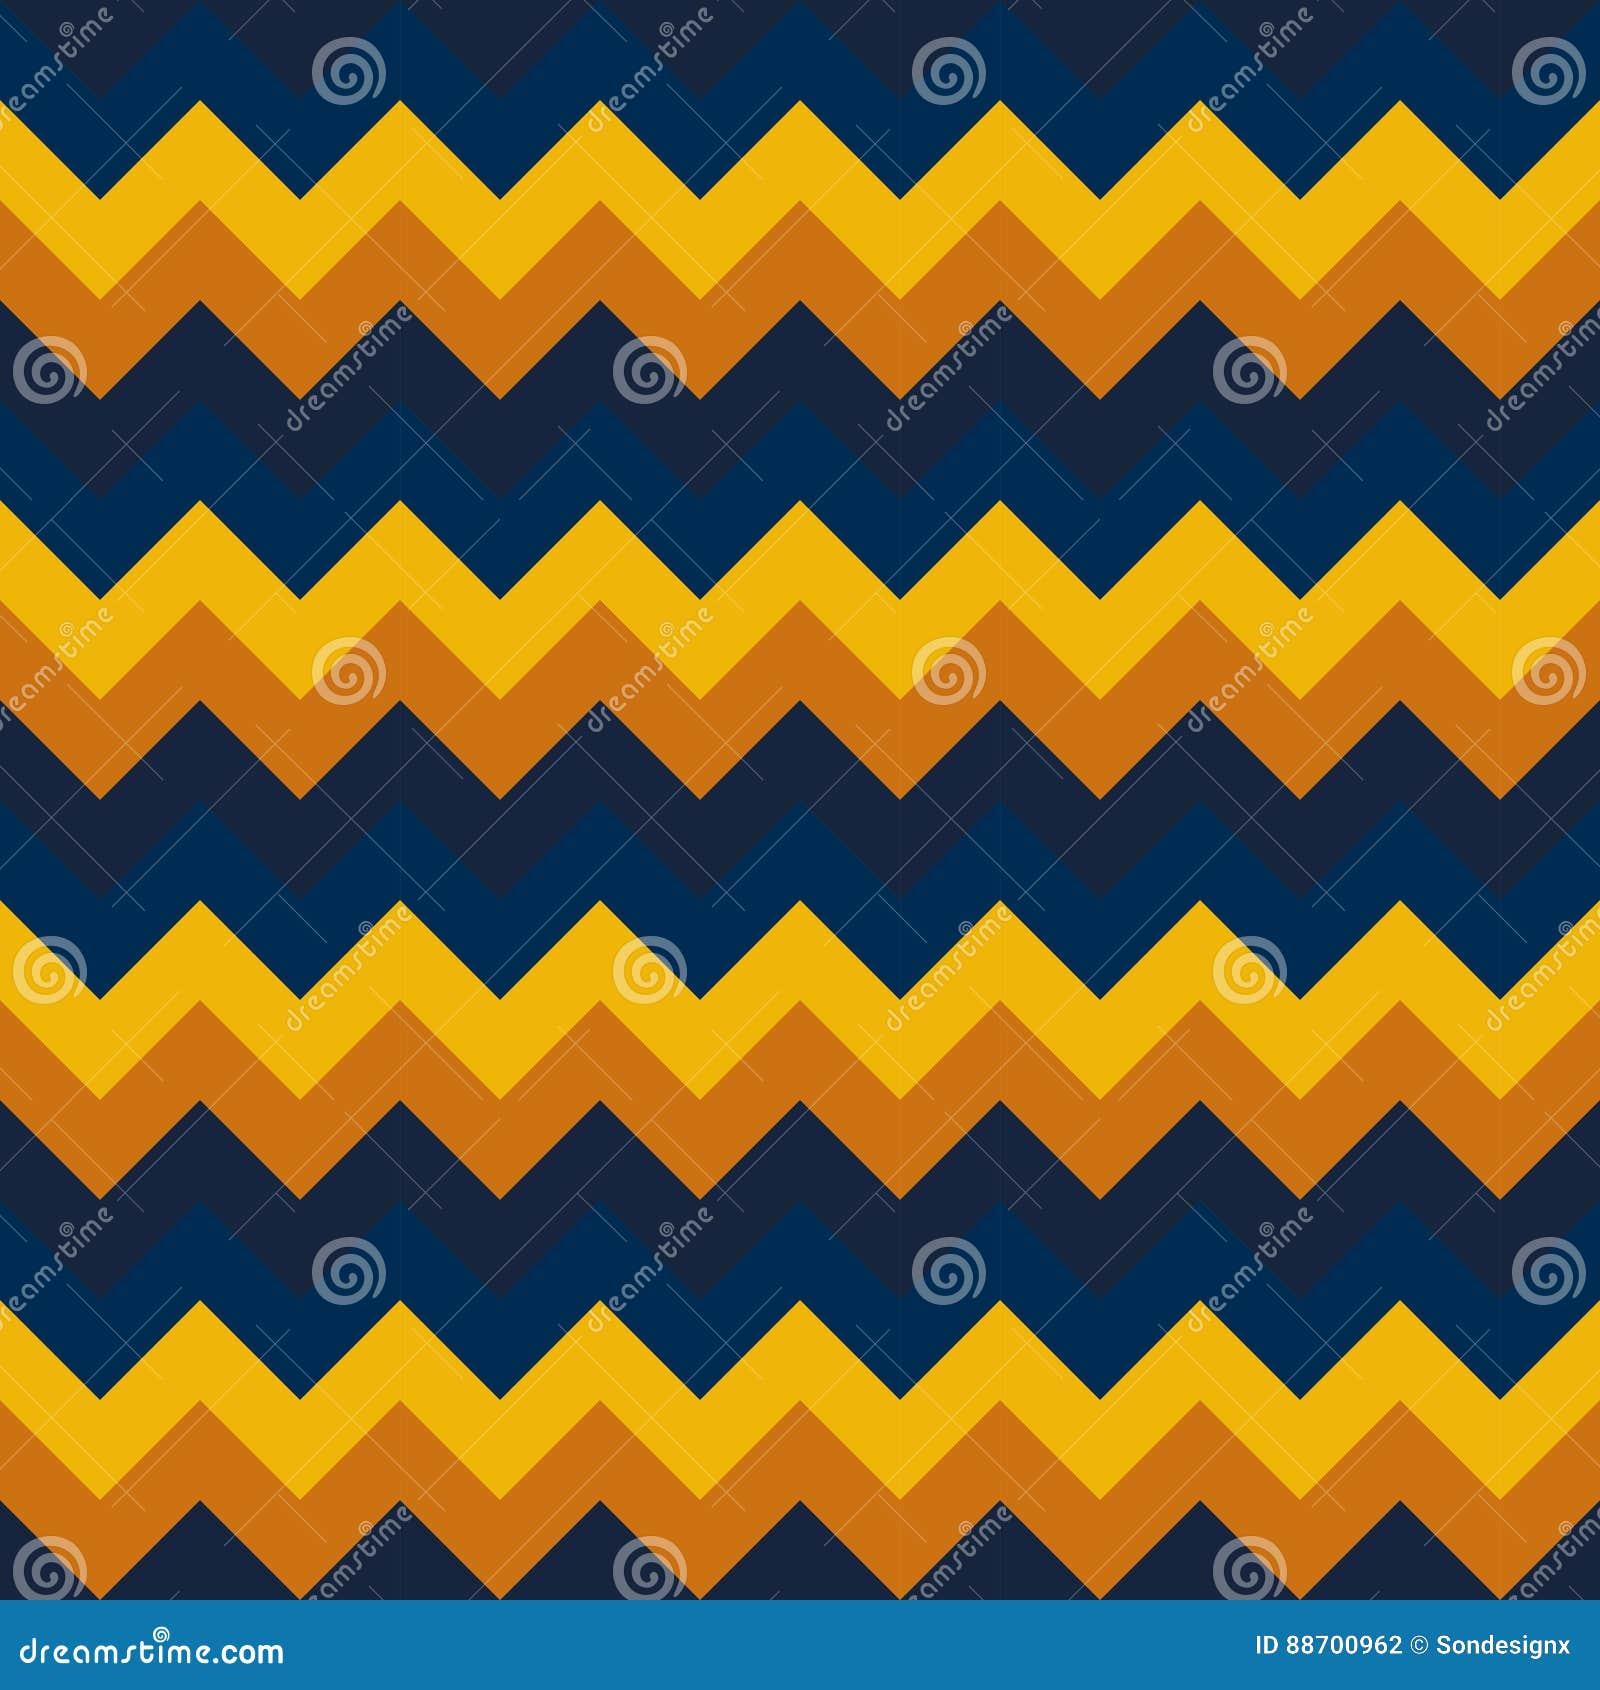 chevron pattern seamless vector arrows geometric design